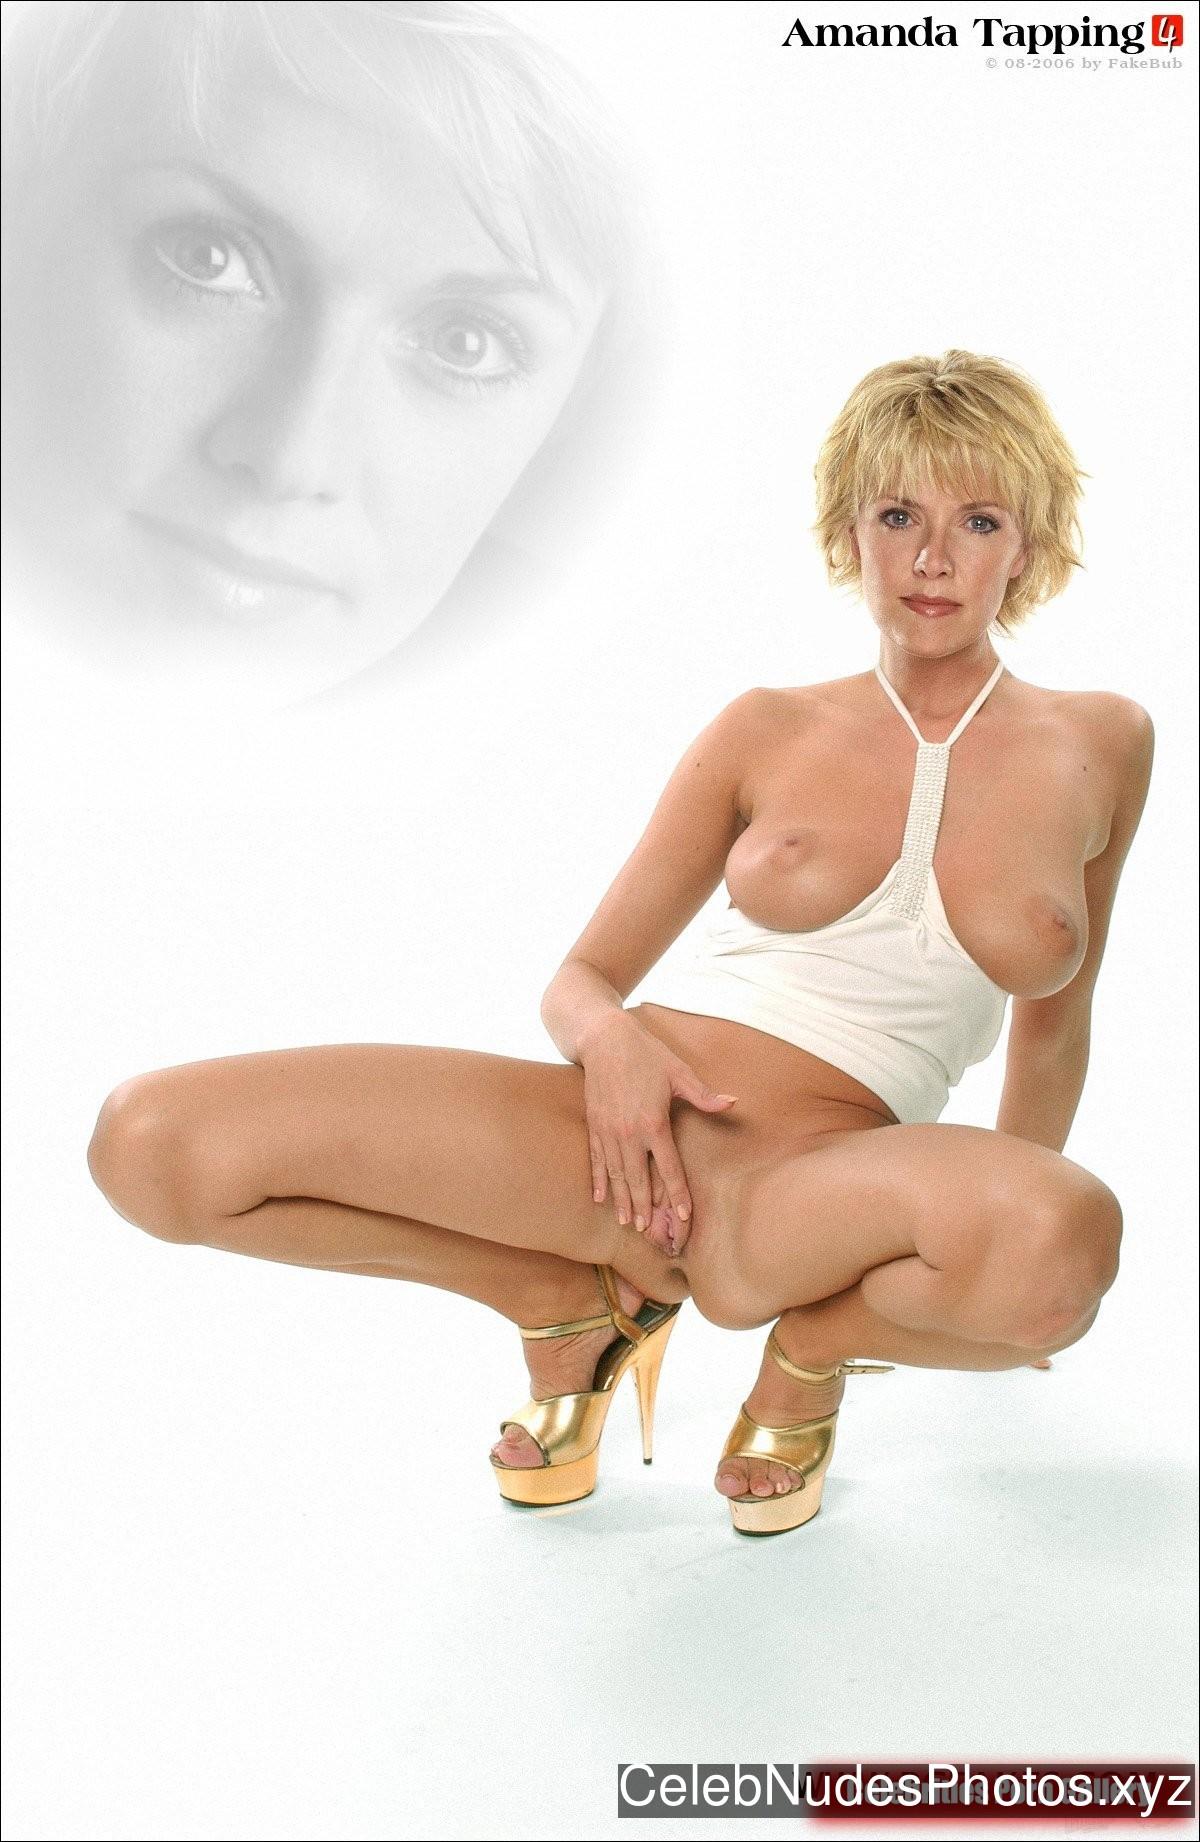 Amanda Tapping Free Nude Celeb sexy 14